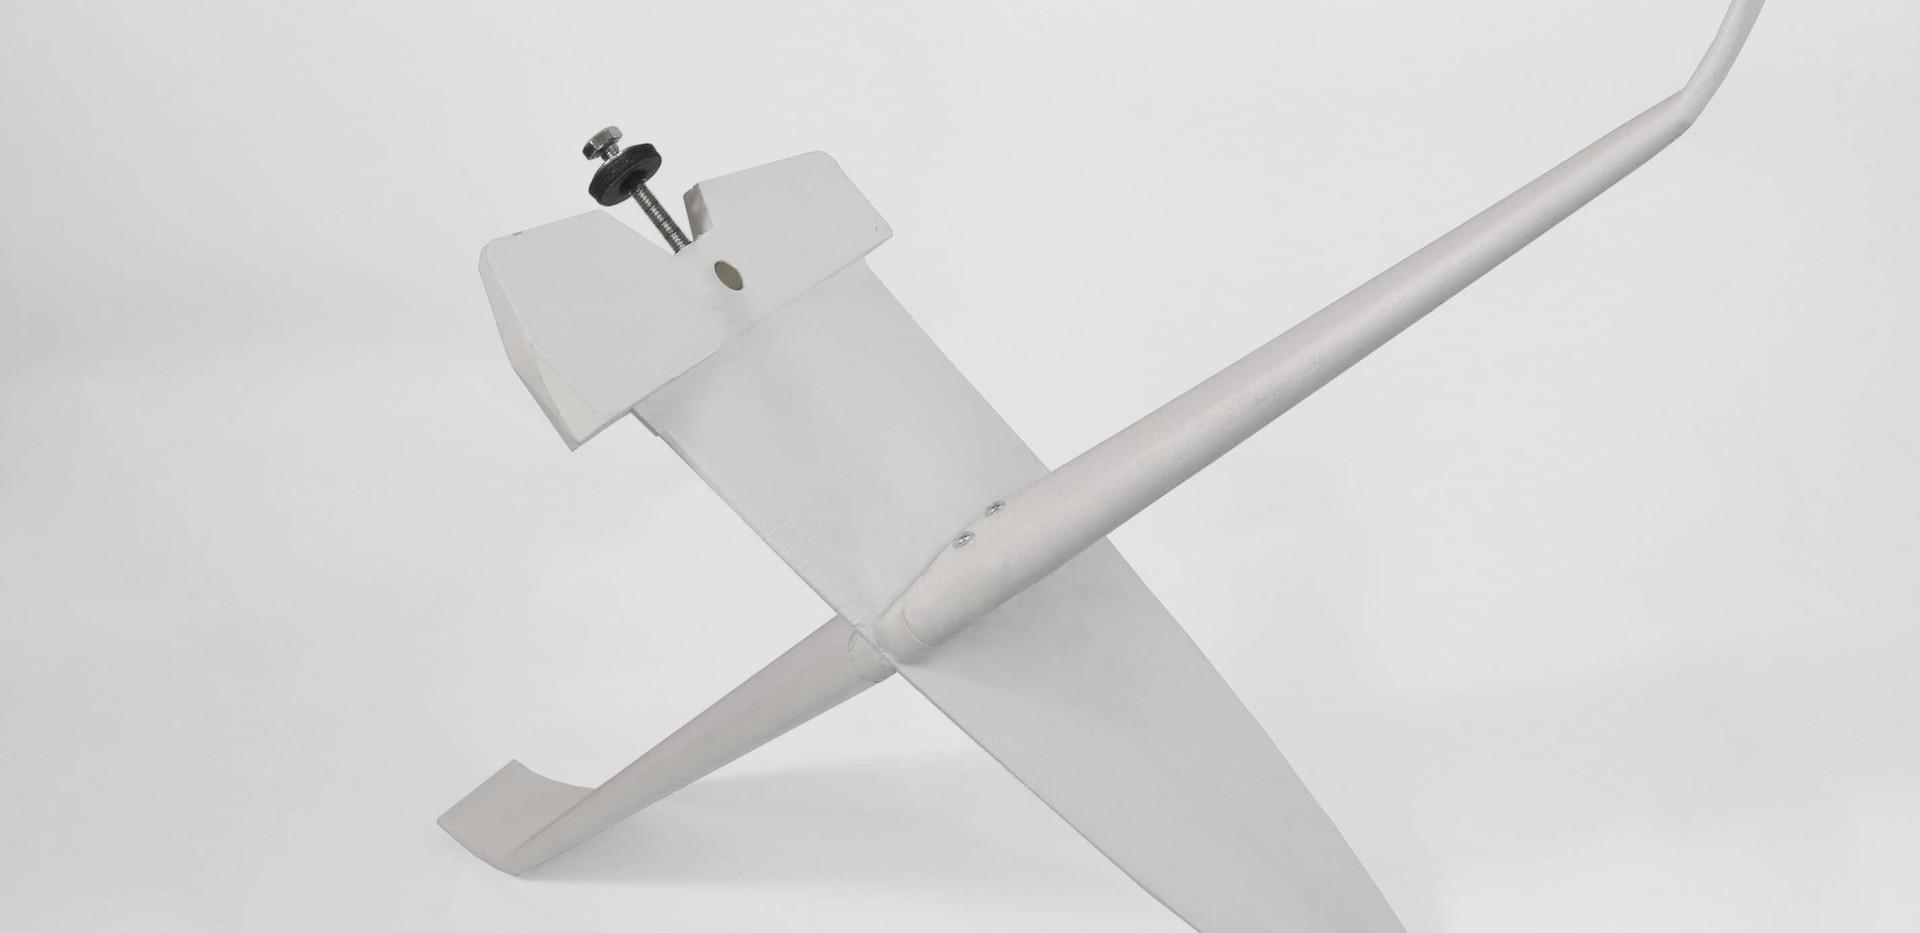 3D Printed Surfboard Fin - Side View.jpg